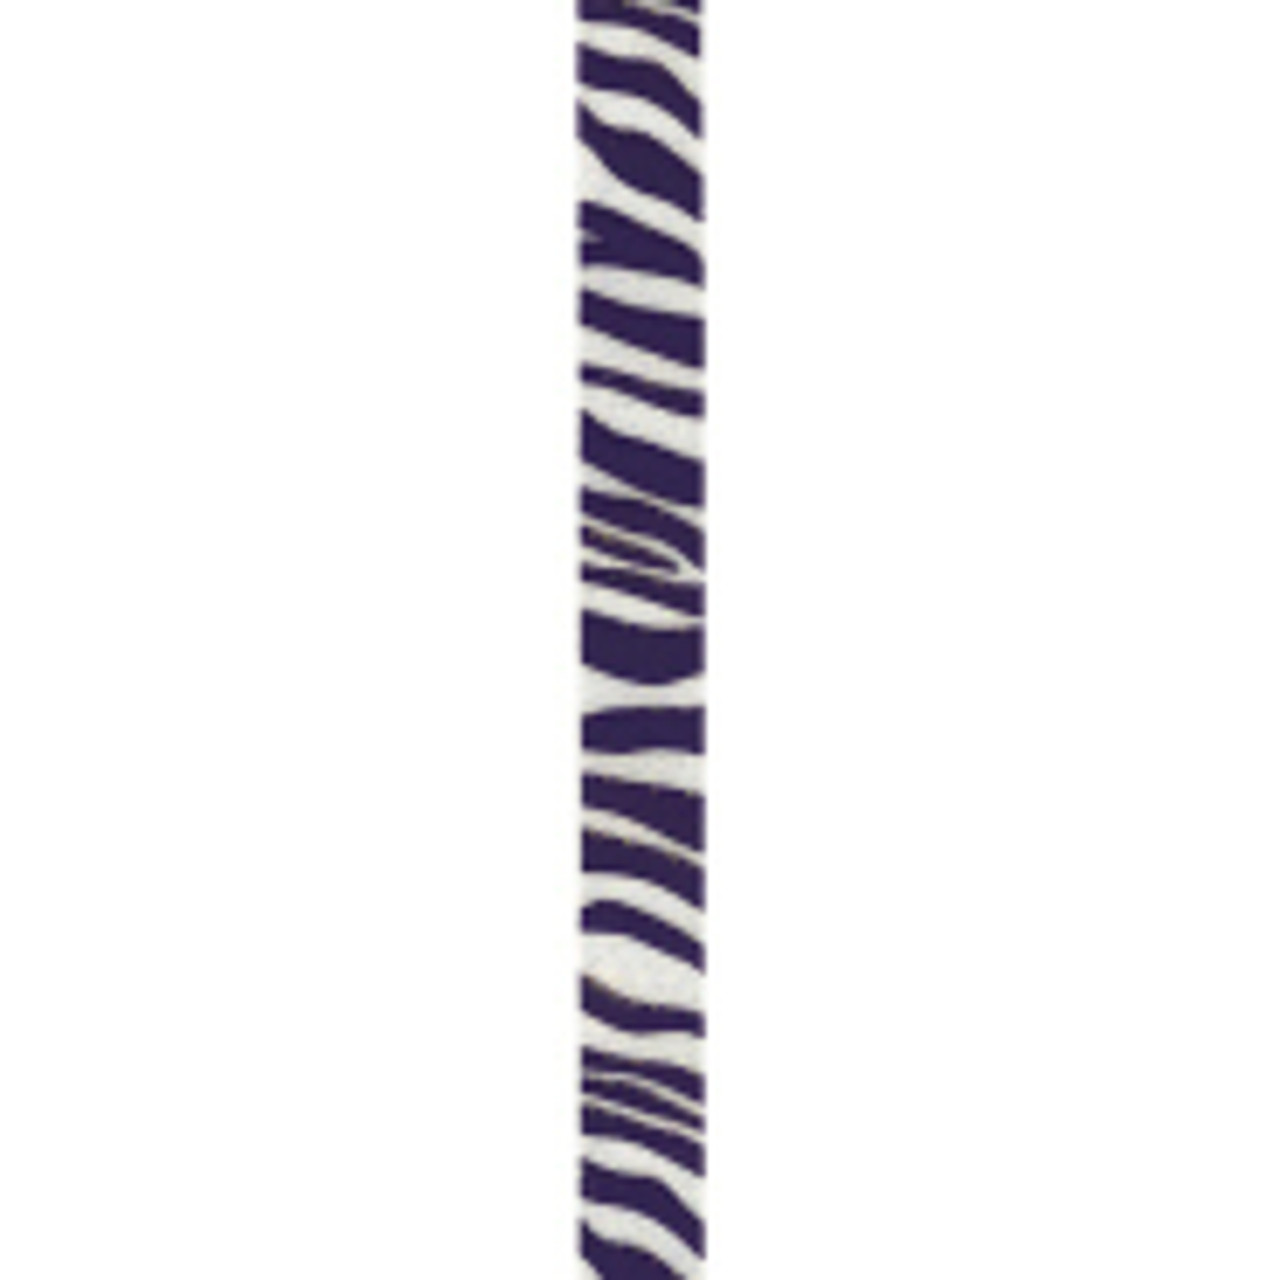 Royal Zebra Crystal Ribbon